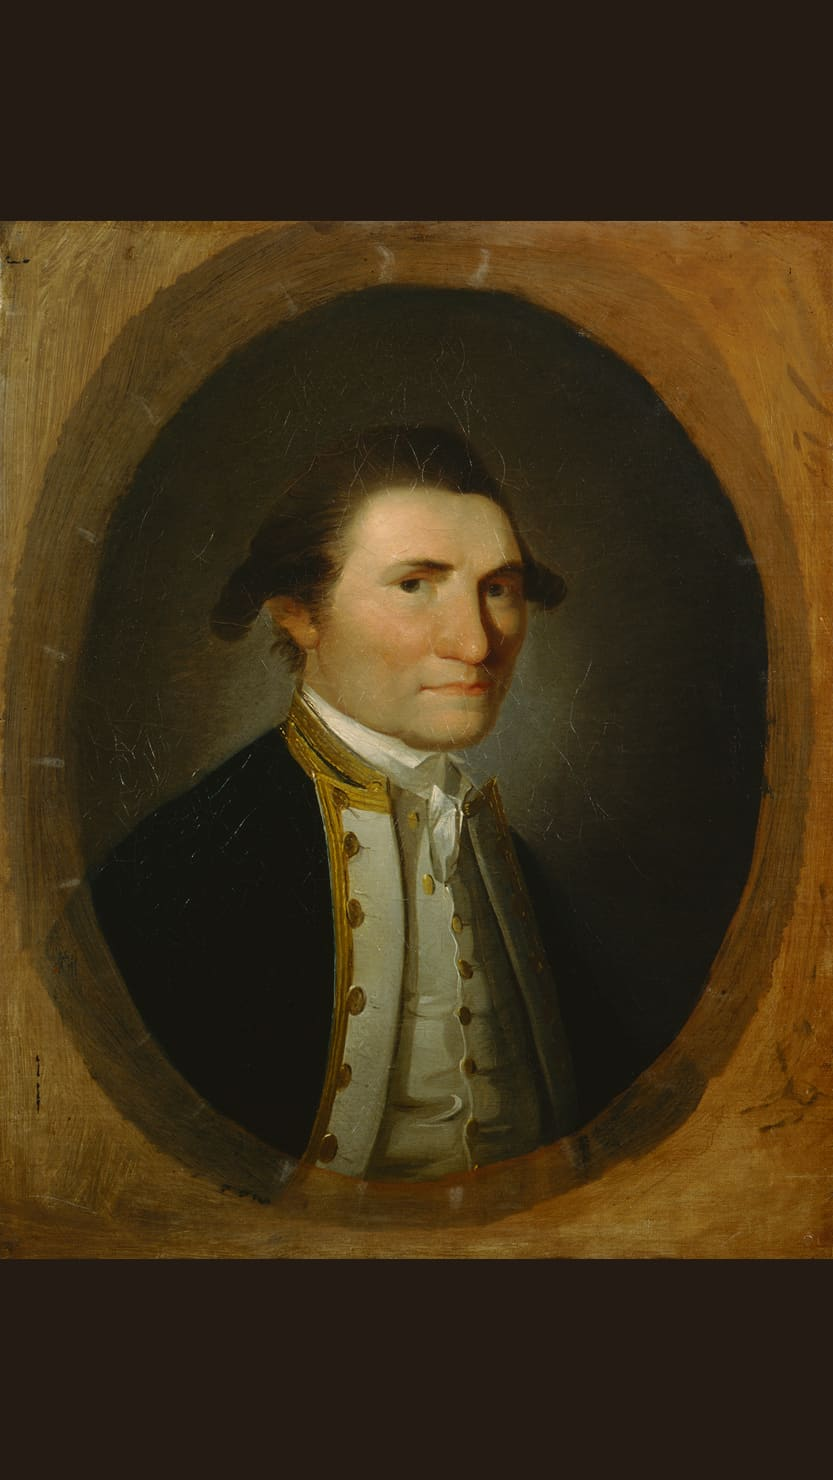 James Cook, 1776 by John Webber © National Portrait Gallery